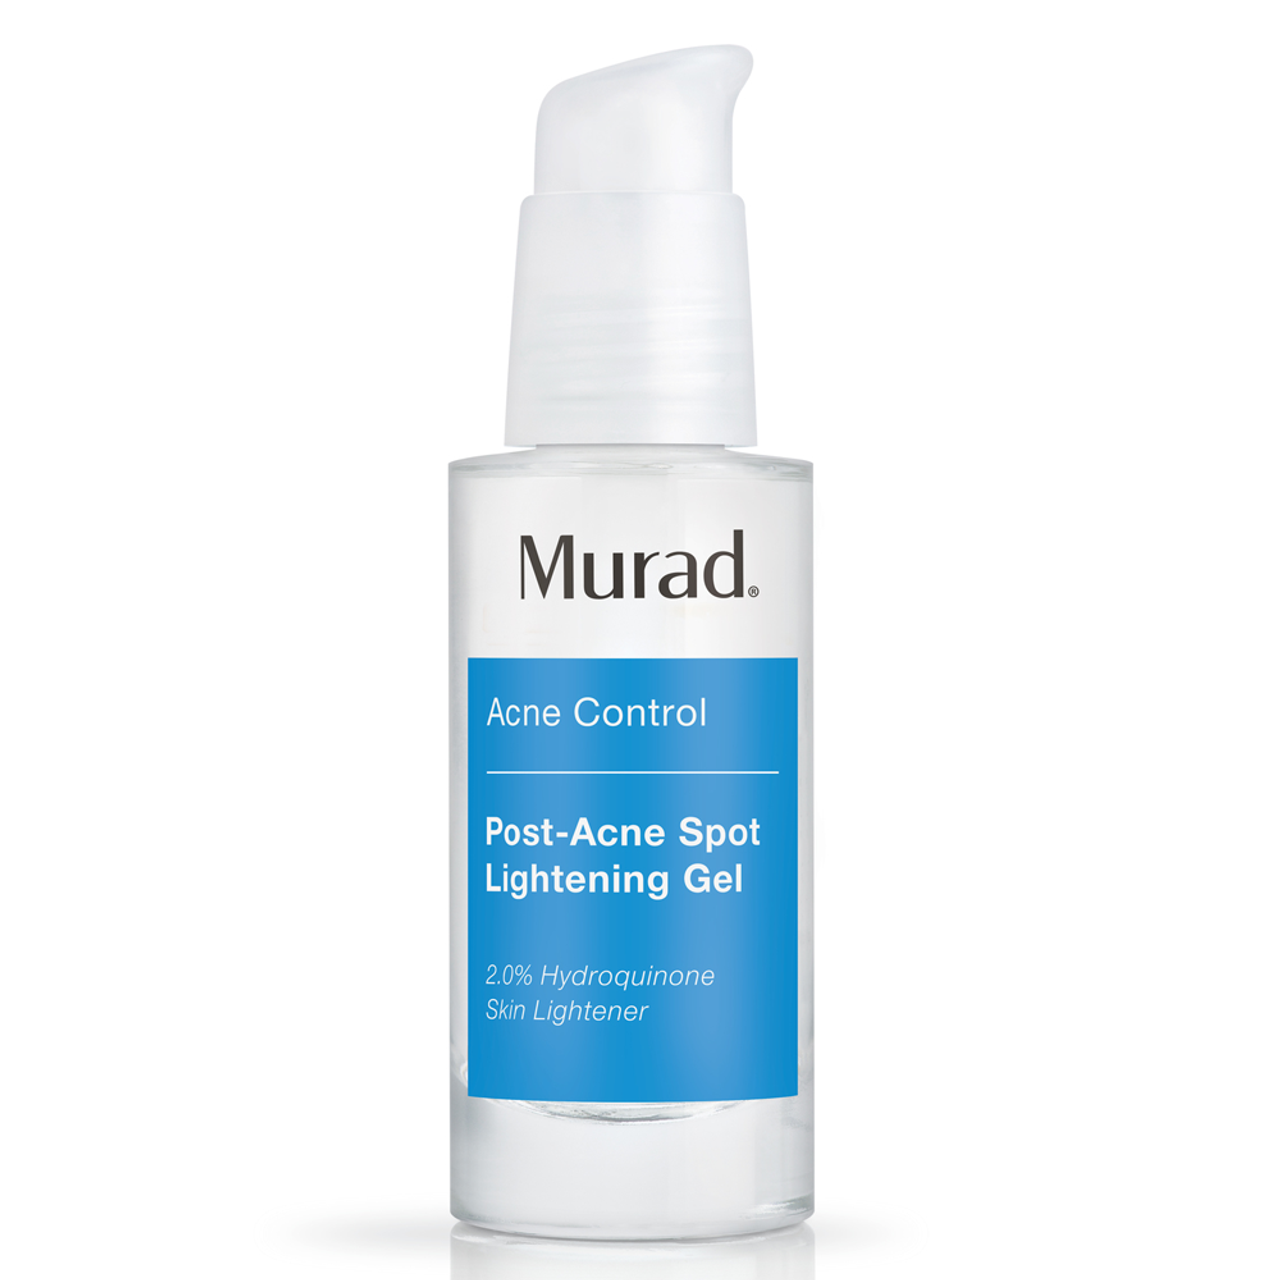 Murad Acne Control Post-Acne Spot Lightening Gel